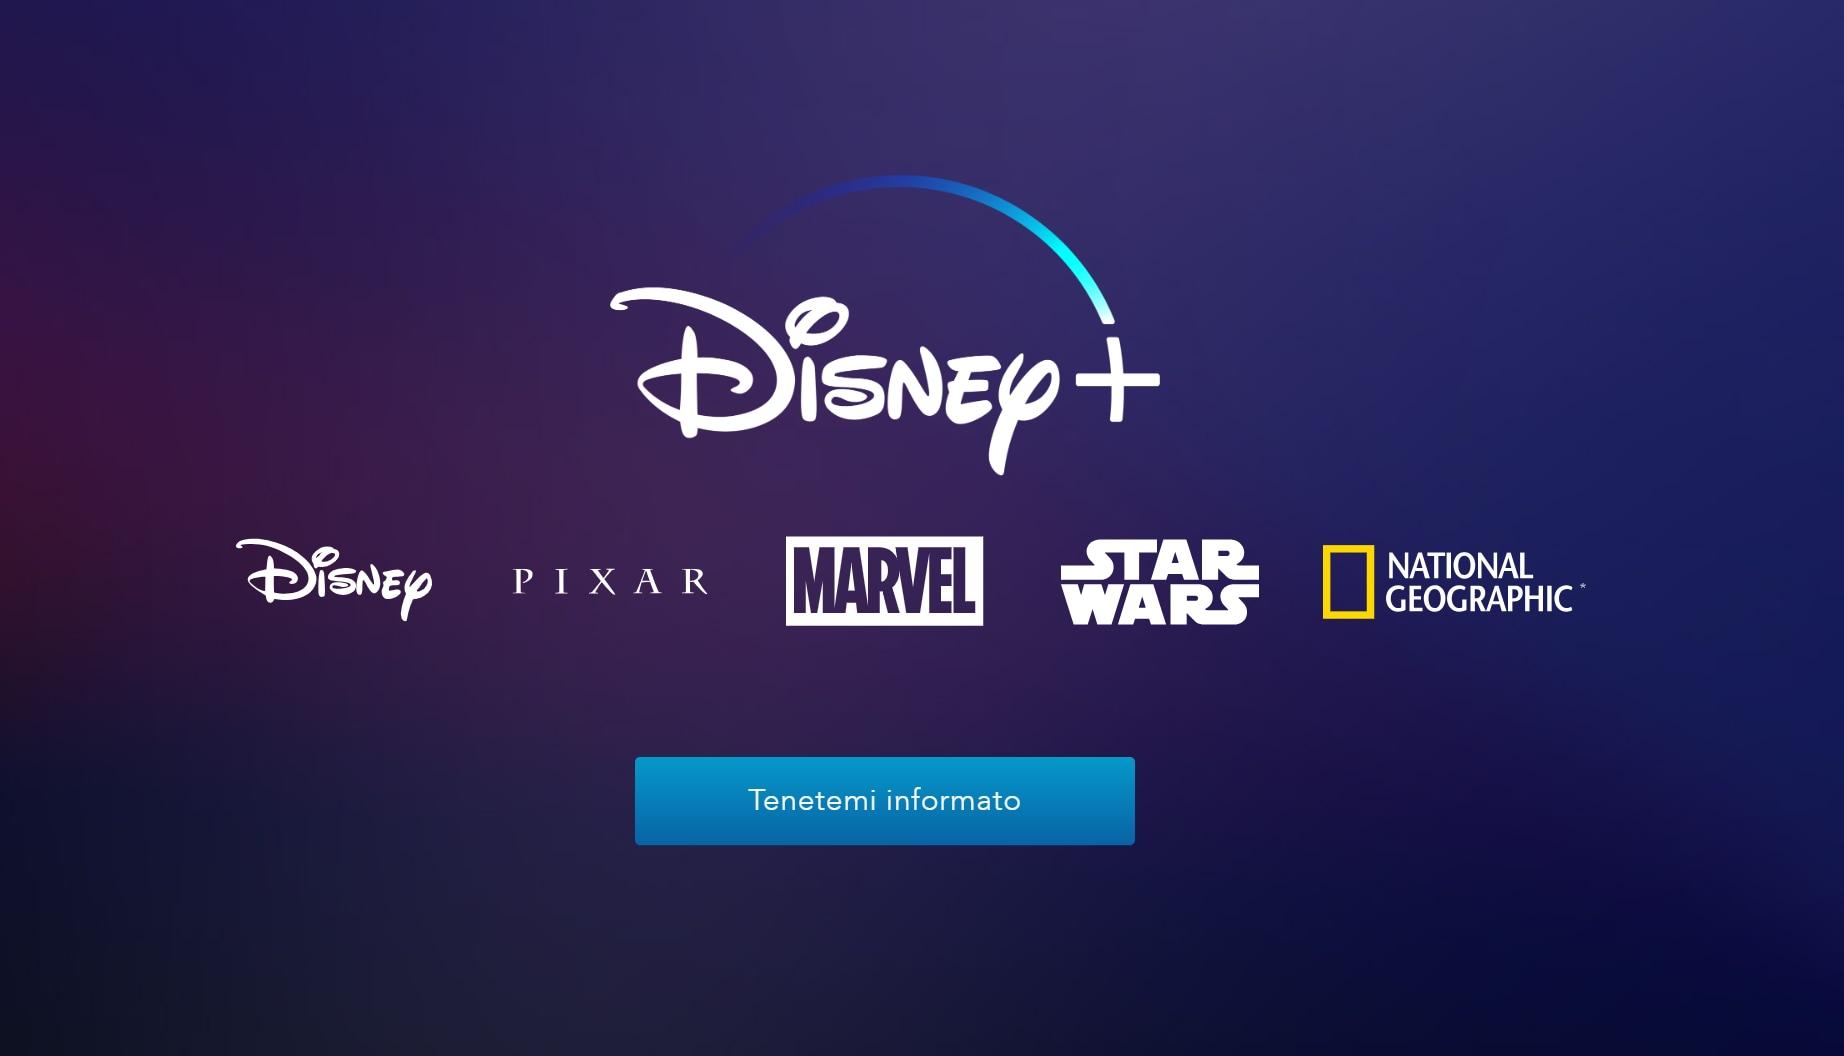 Disney+ mostra i muscoli. Avengers: Endgame sarà una sua esclusiva